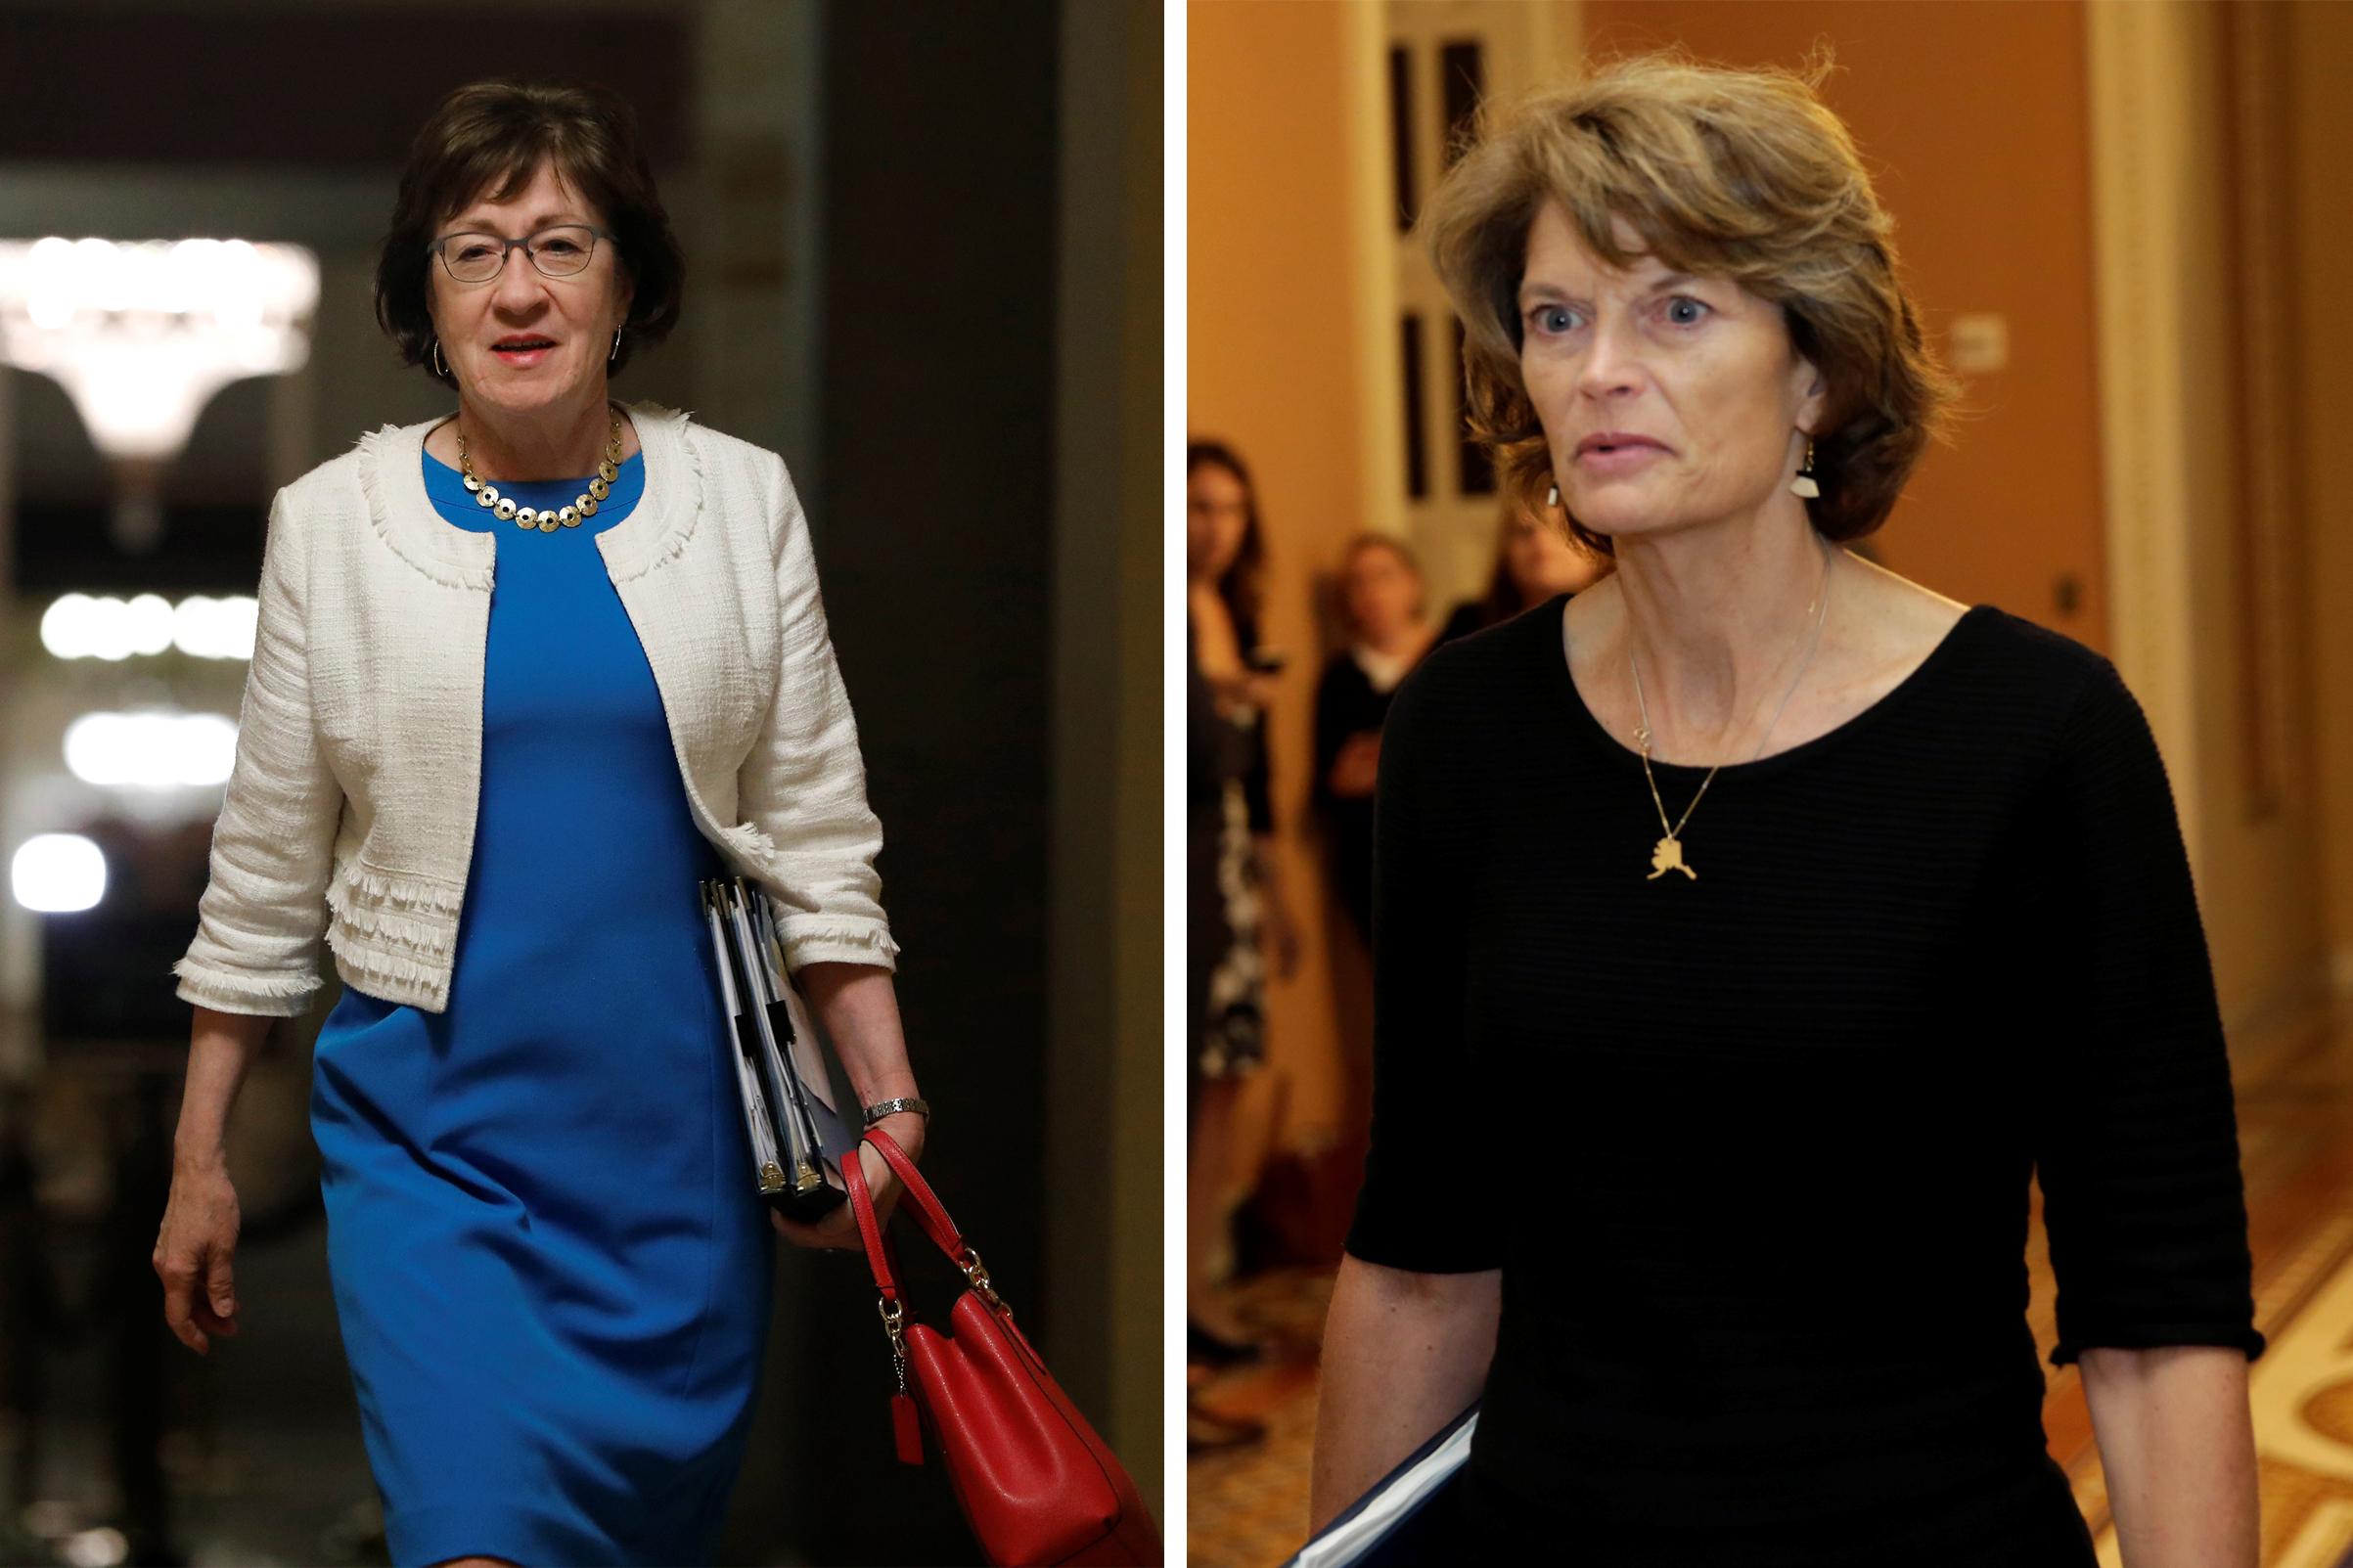 Senator Susan Collins (R-ME) and Senator Lisa Murkowski (R-AK) walk to the Senate floor to vote on the health care bill on Capitol Hill on July 27, 2017.